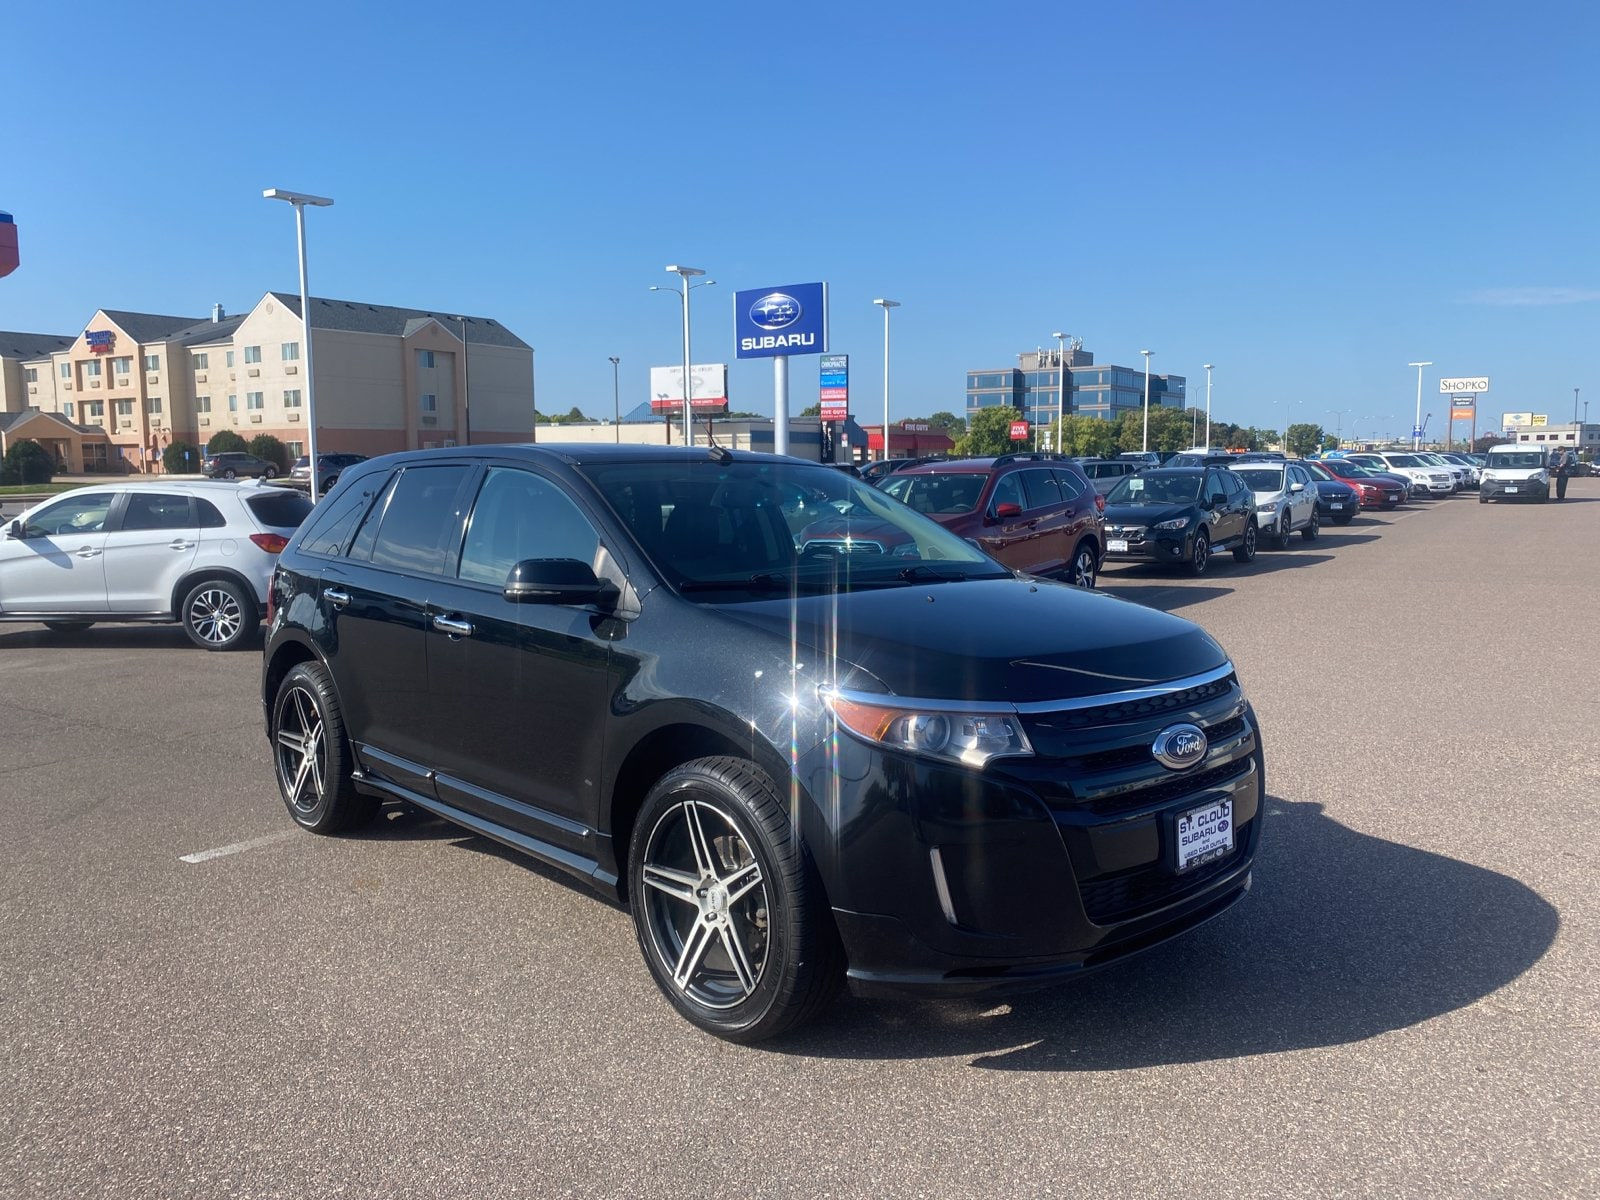 Used 2014 Ford Edge Sport with VIN 2FMDK4AK9EBA72898 for sale in Saint Cloud, Minnesota